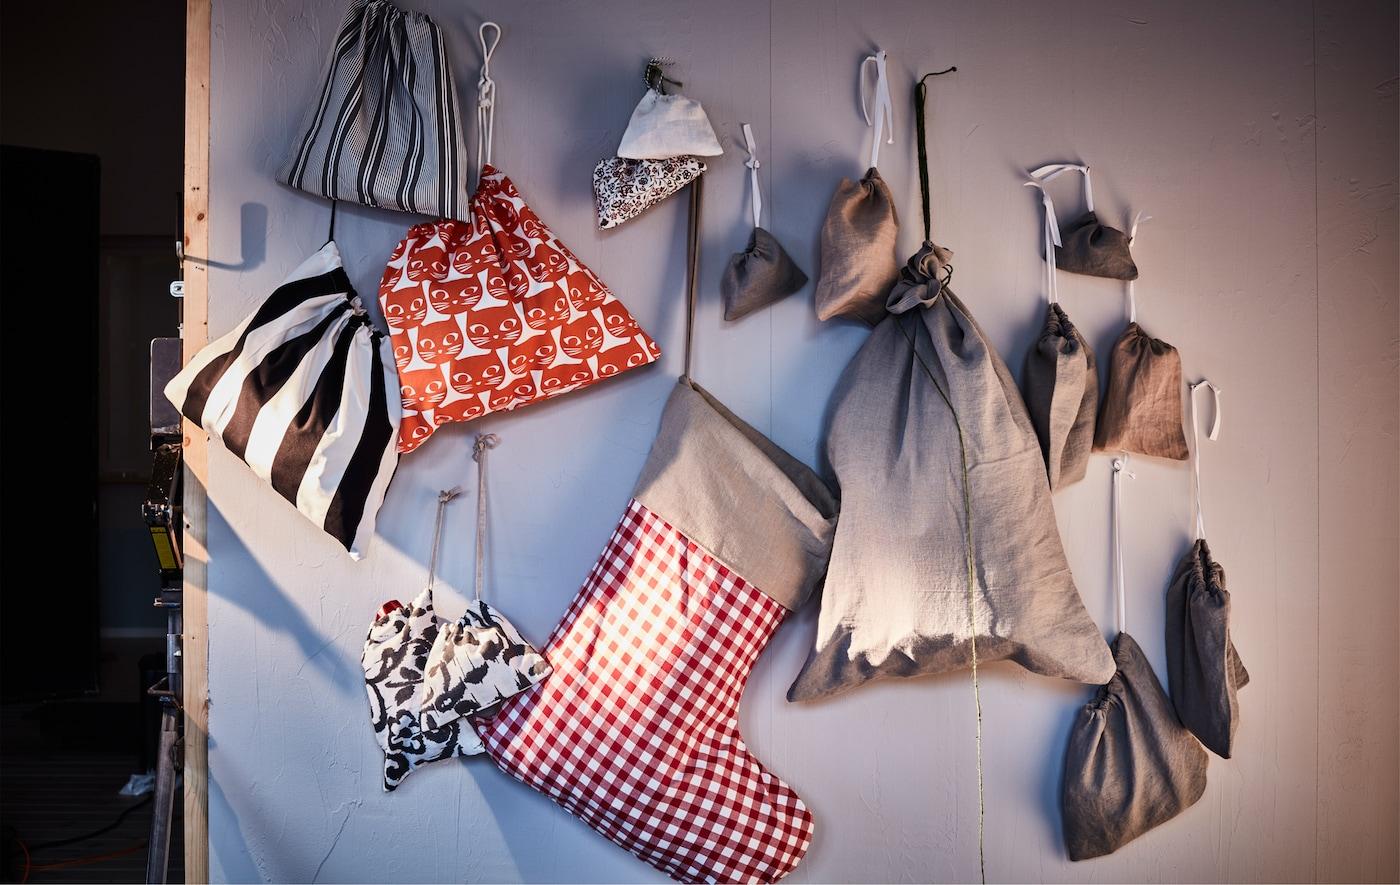 Viele verschiedene Geschenktüten hängen an der Wand.